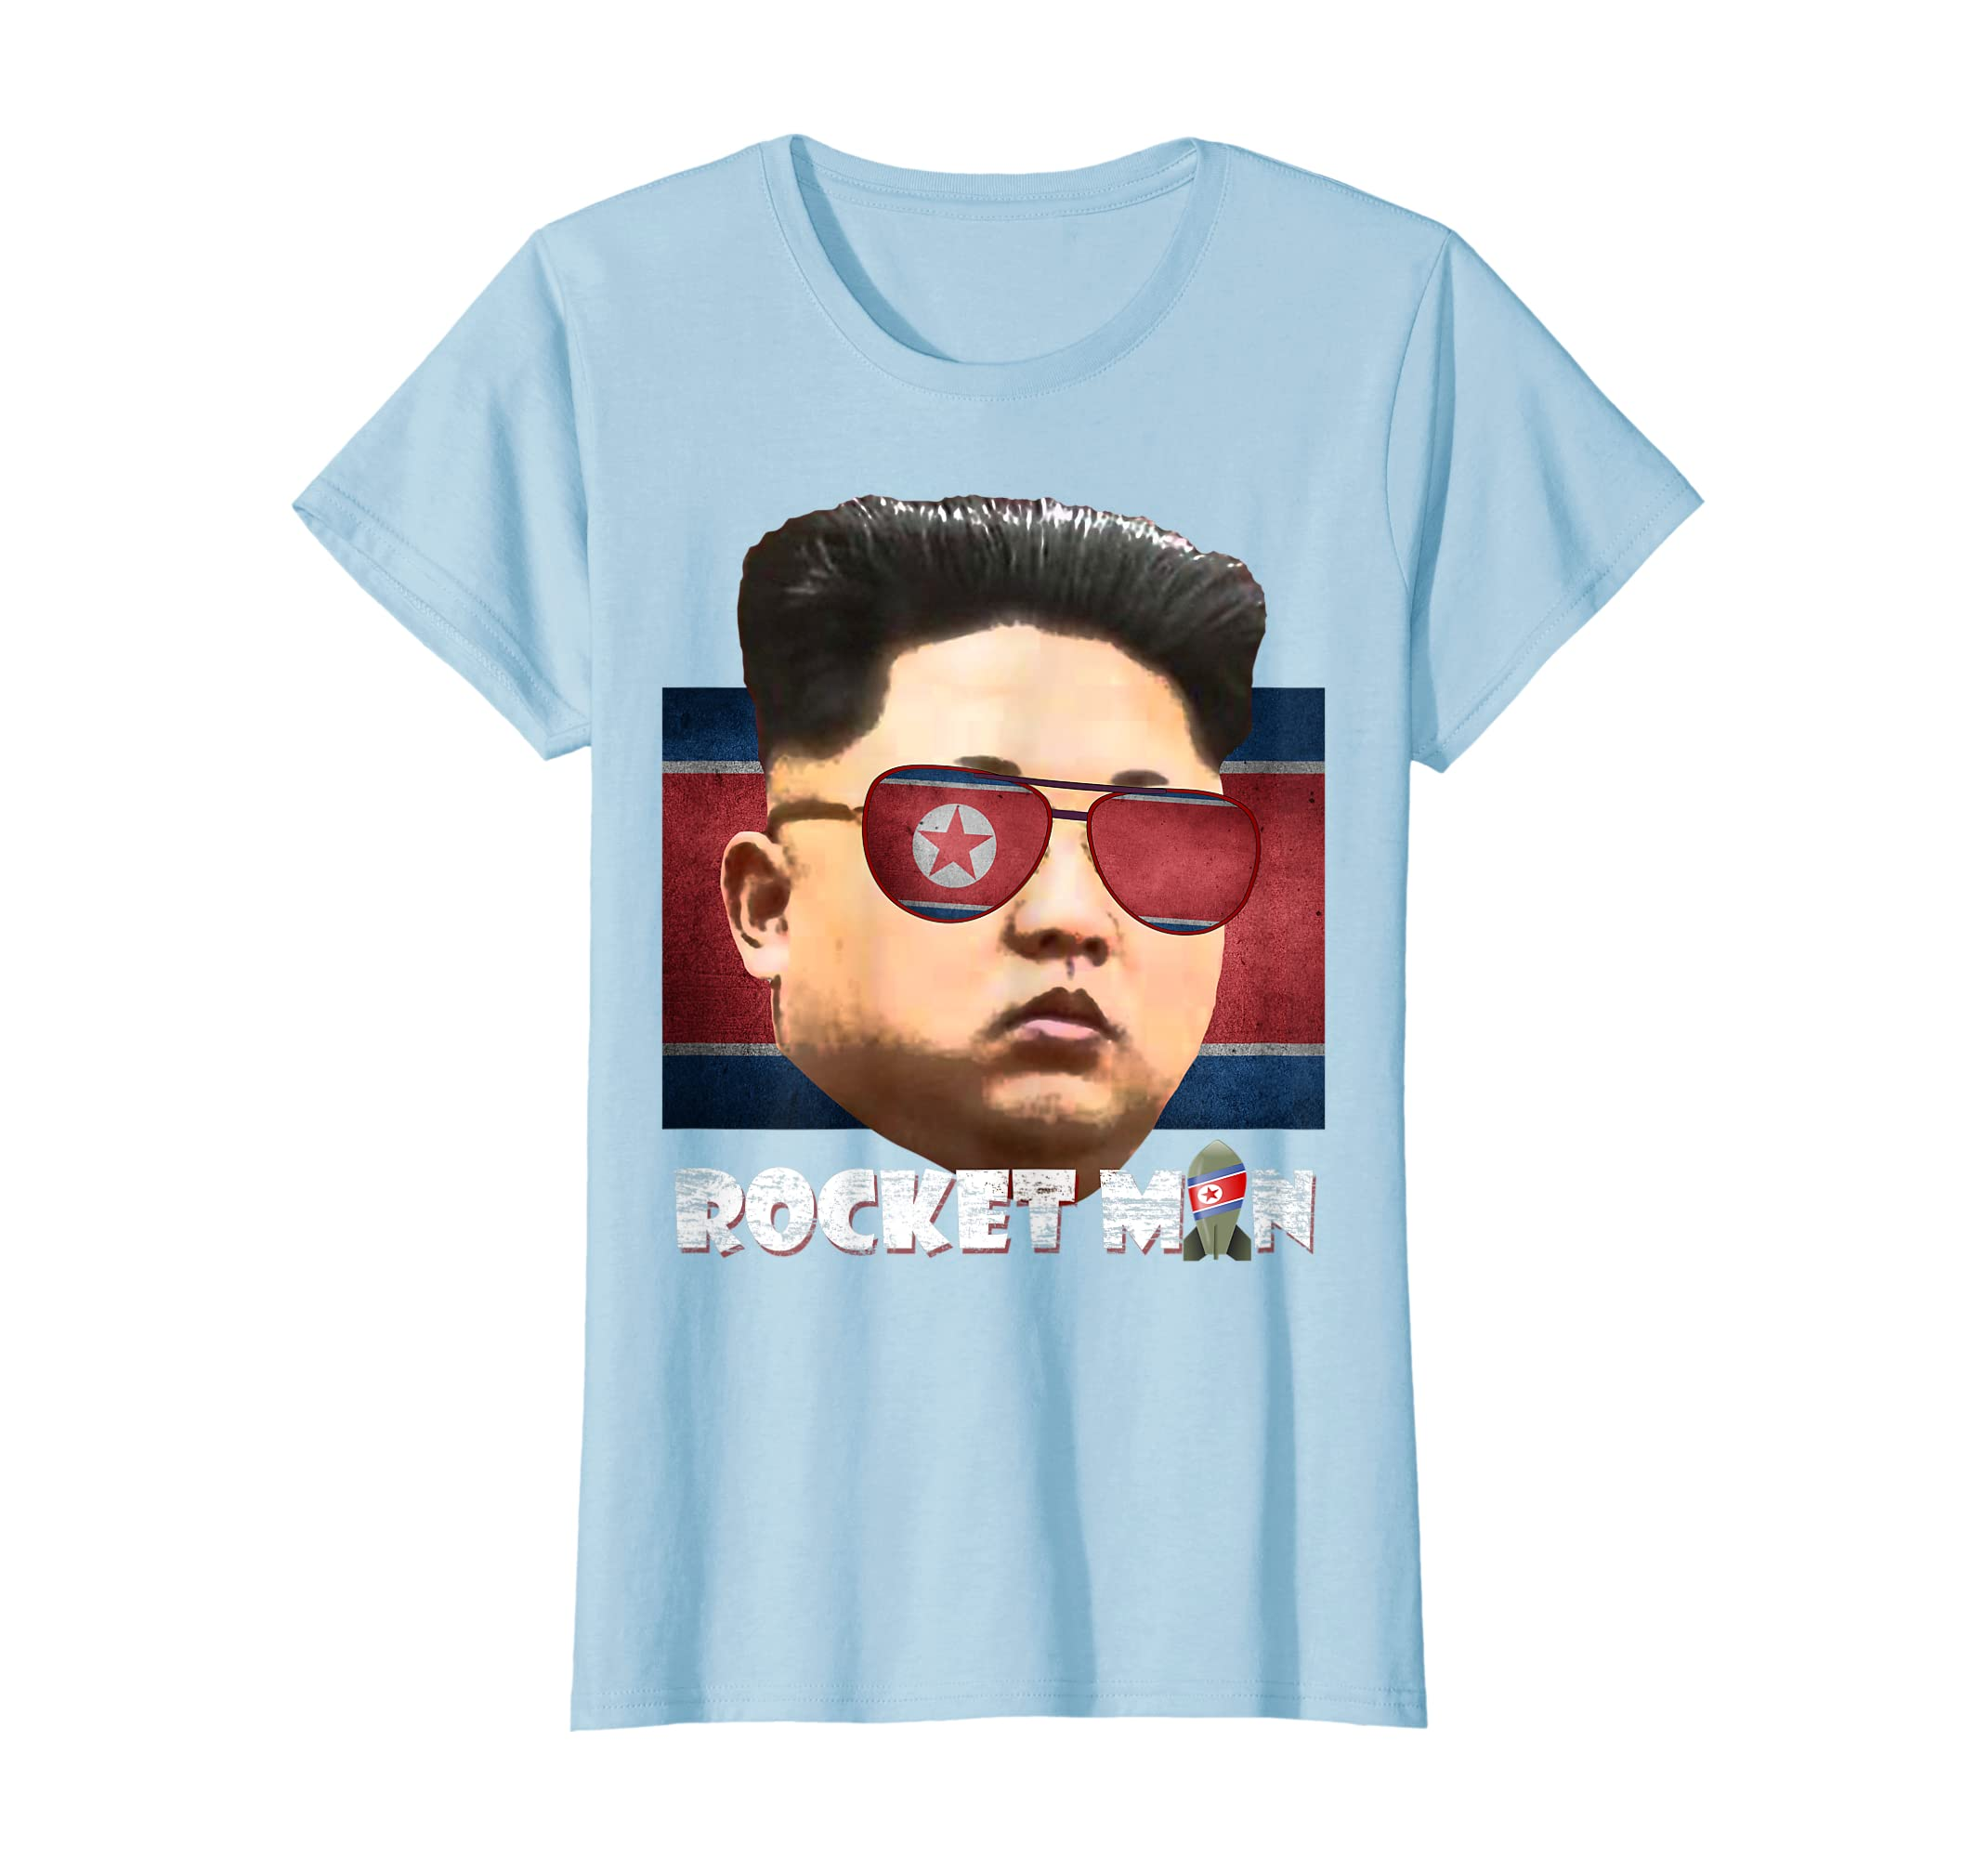 ef6a49a05 Amazon.com: Cool Rocket Man Kim Jong-Un T-Shirt: Clothing